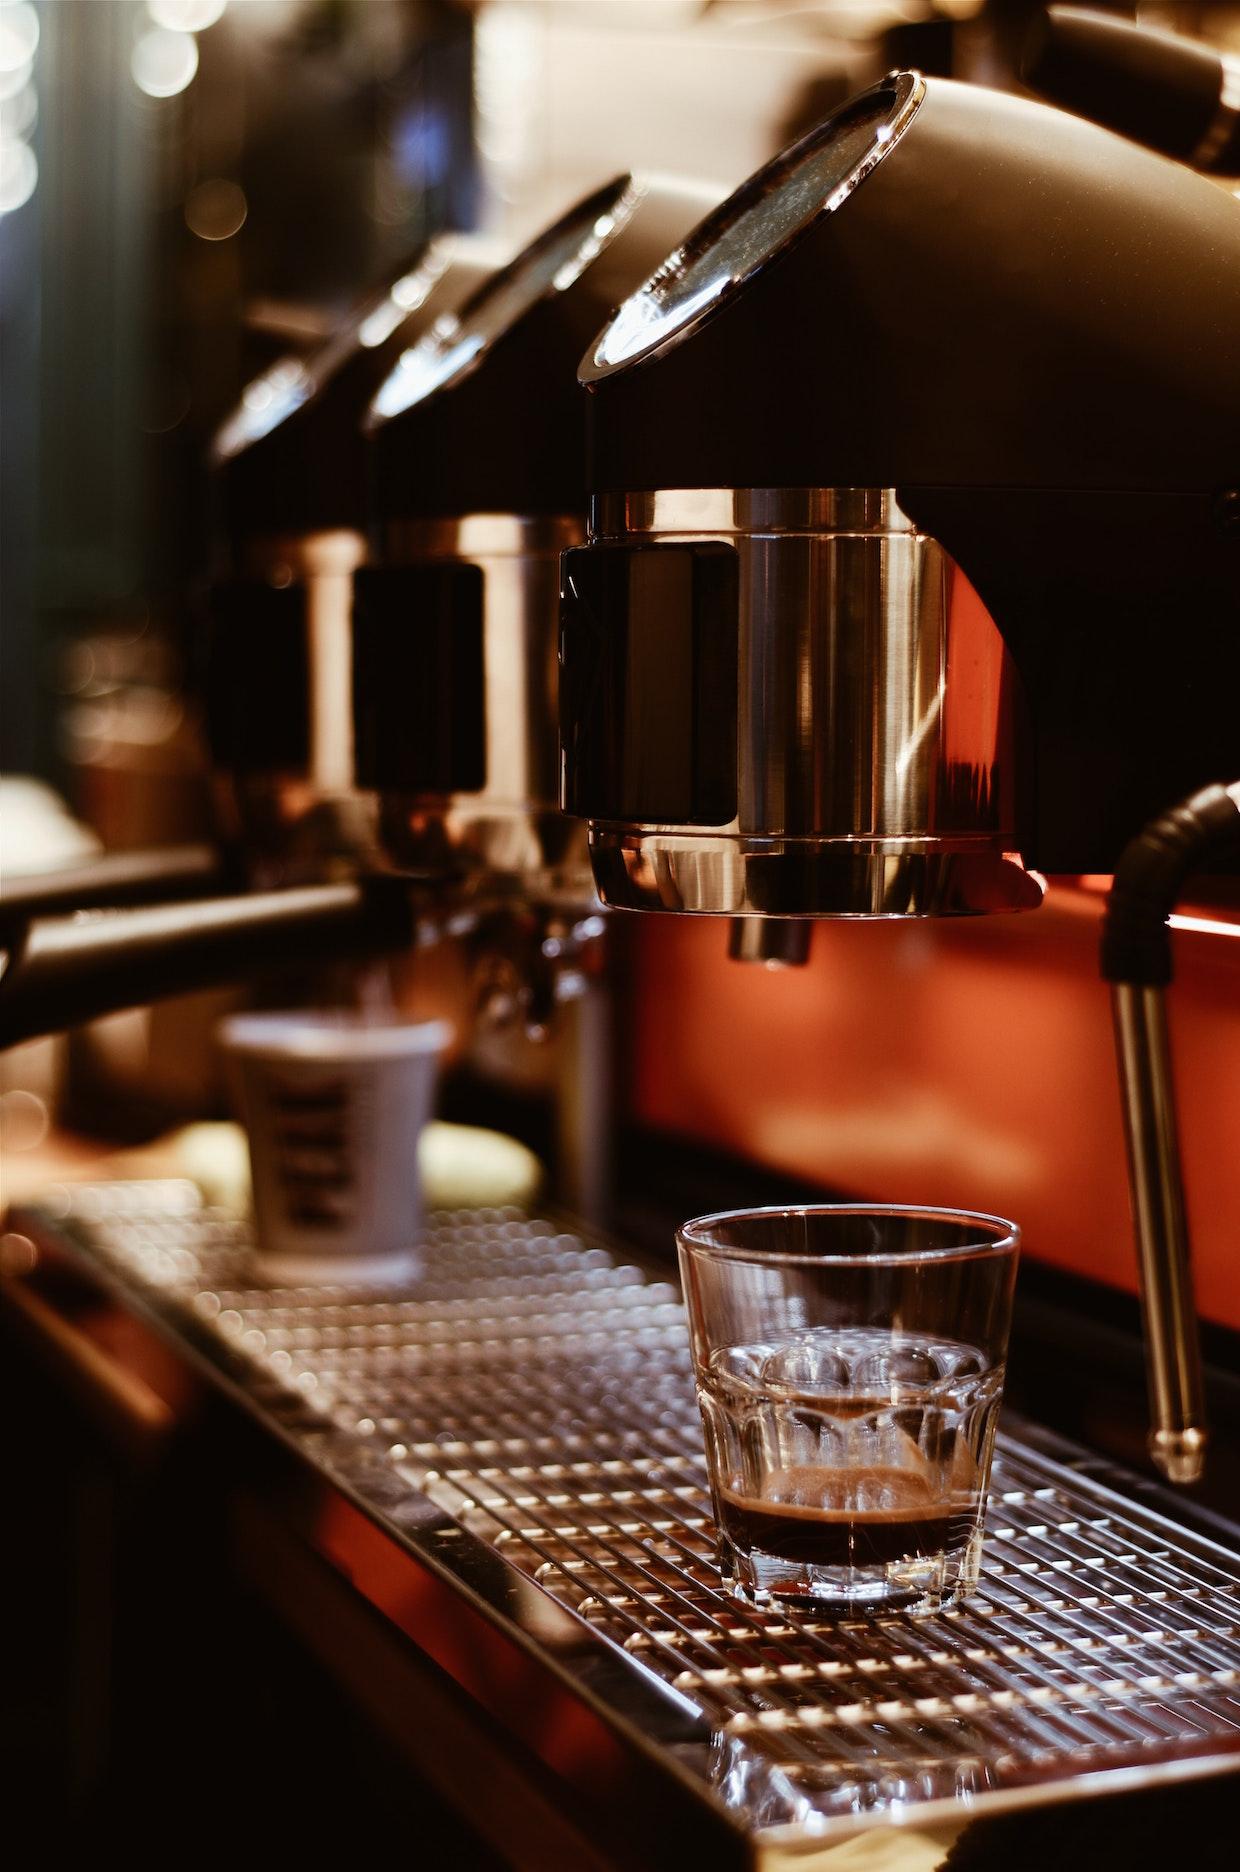 espresso-machine-shot